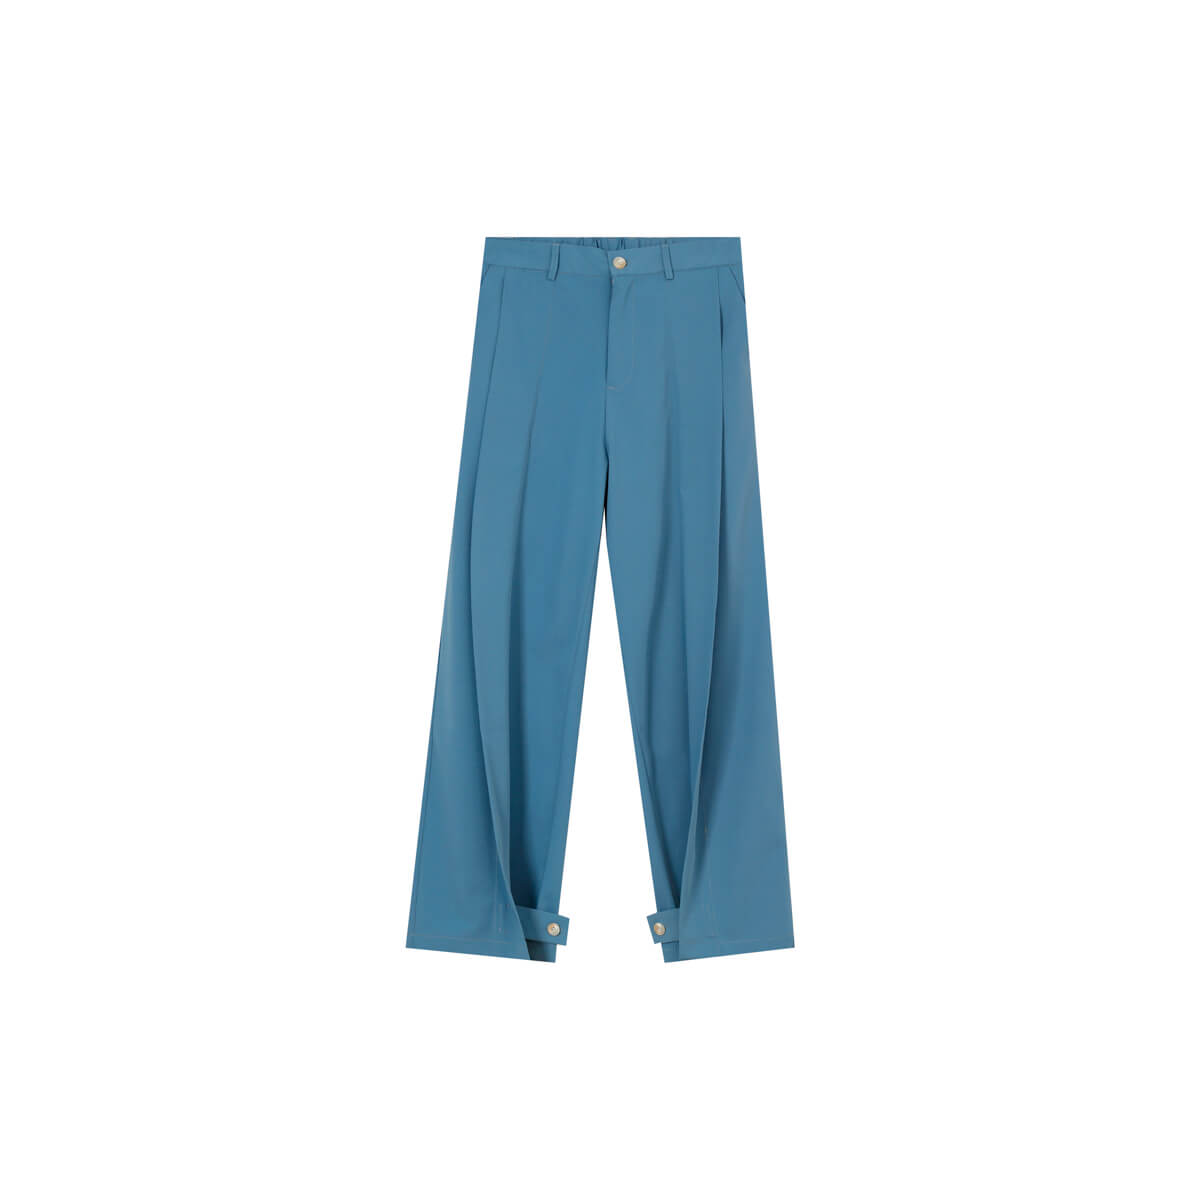 Брюки Cui Layout Studio Draped Crumple Trousers Light Blue